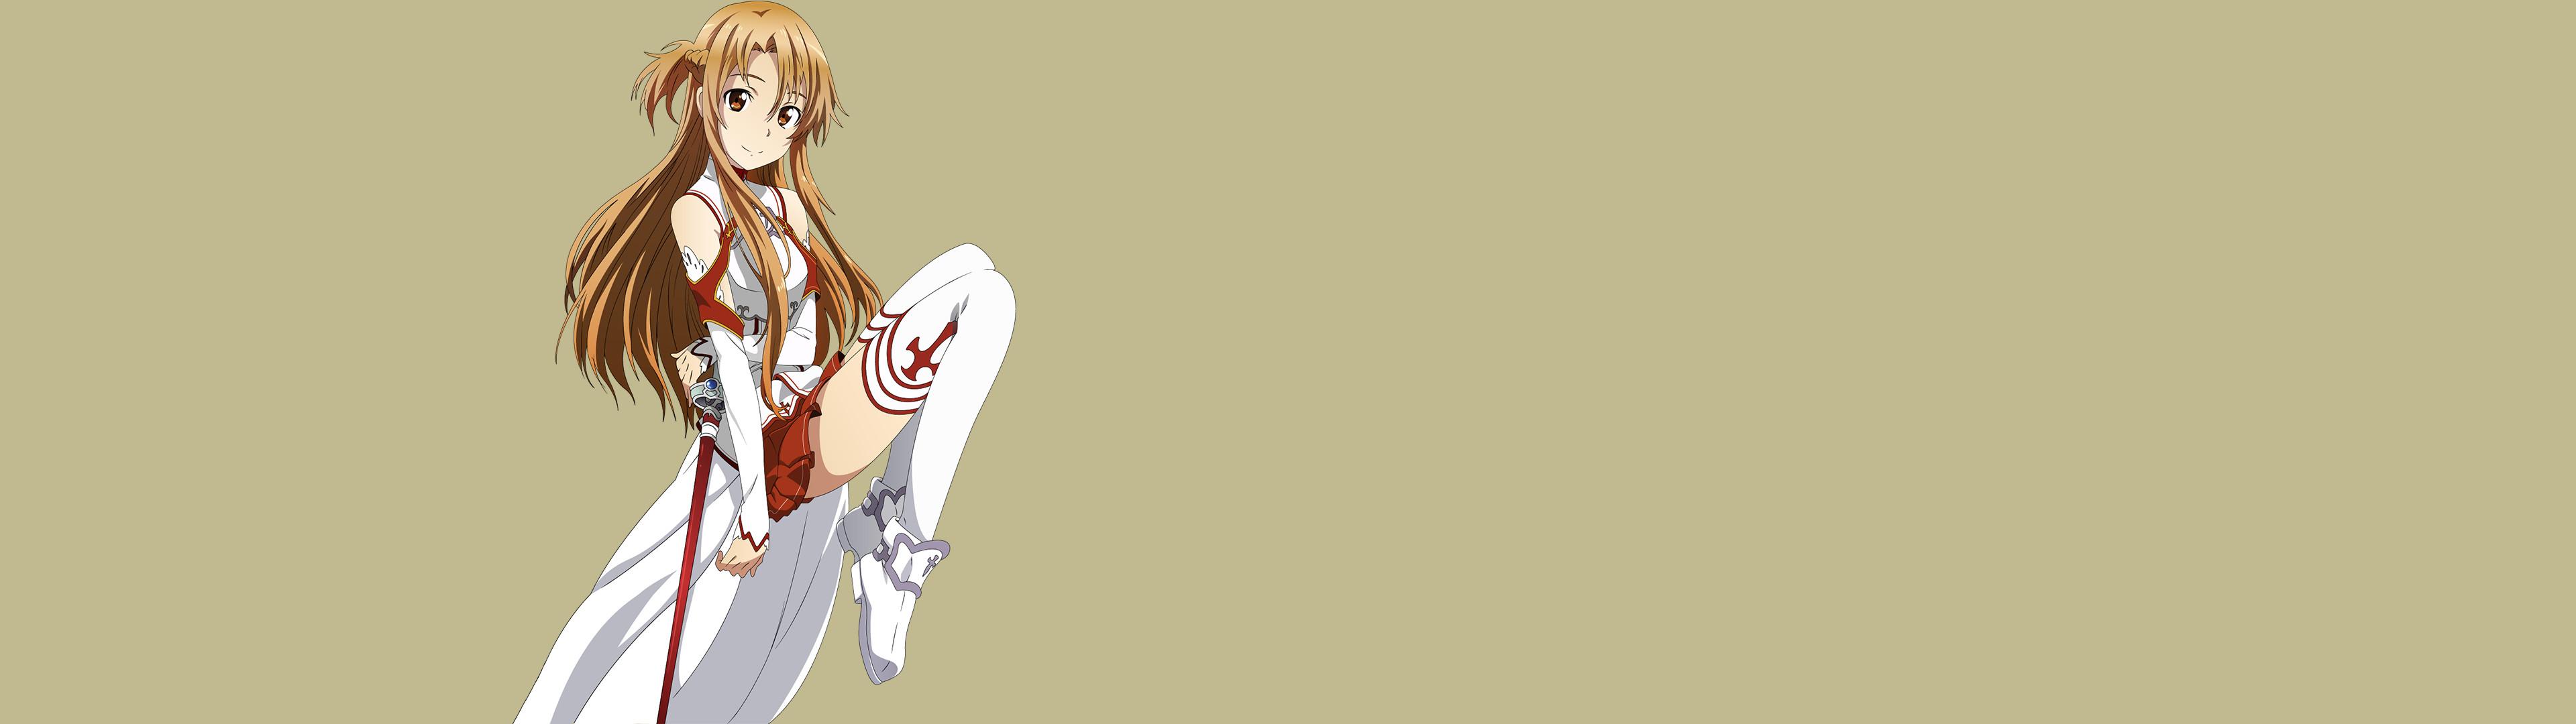 Anime <b>Wallpaper 3840×1080</b> – WallpaperSafari